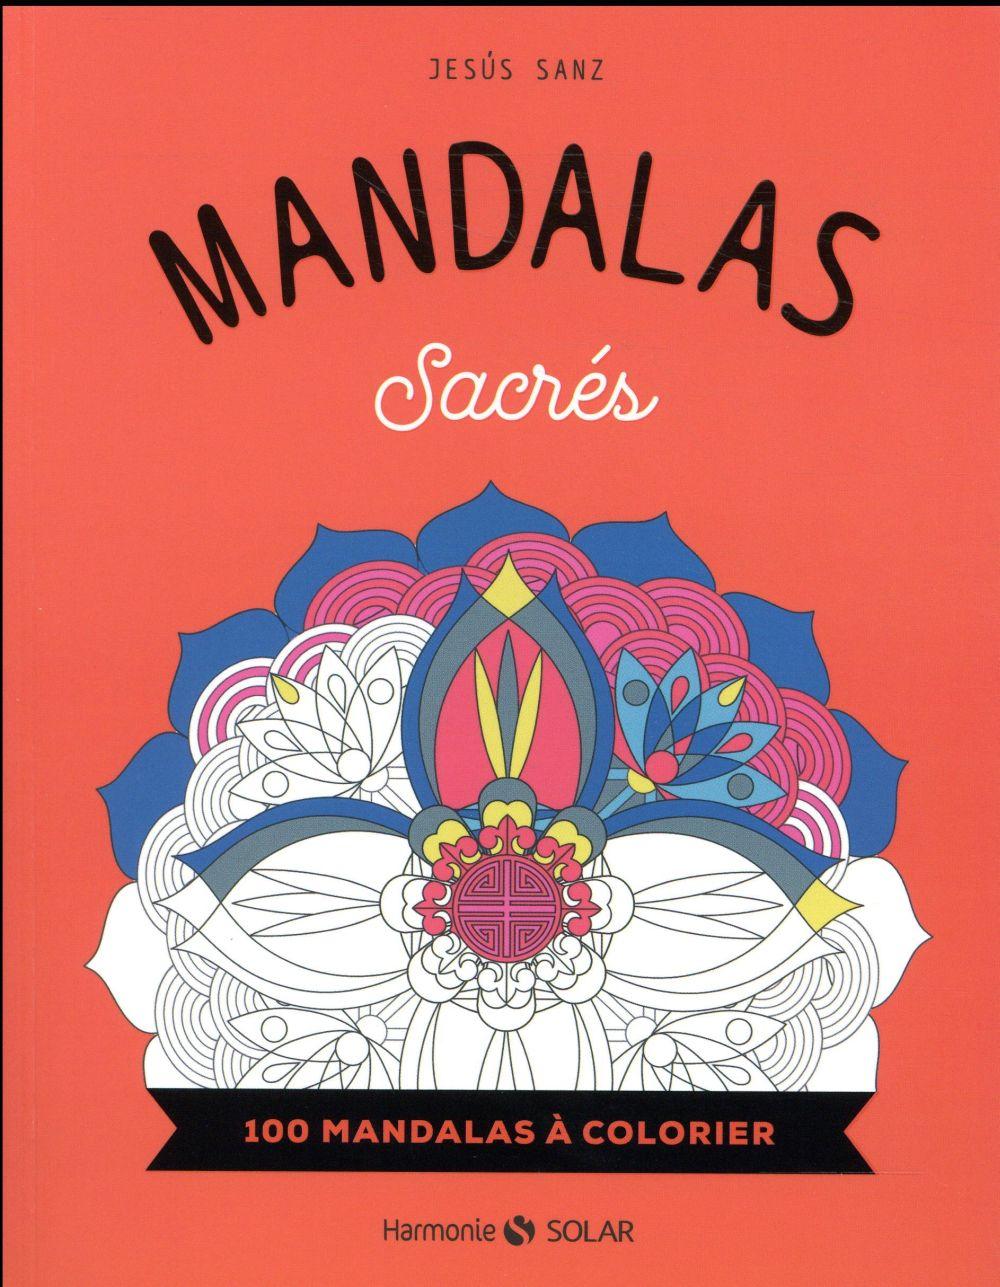 MANDALAS - SACRES